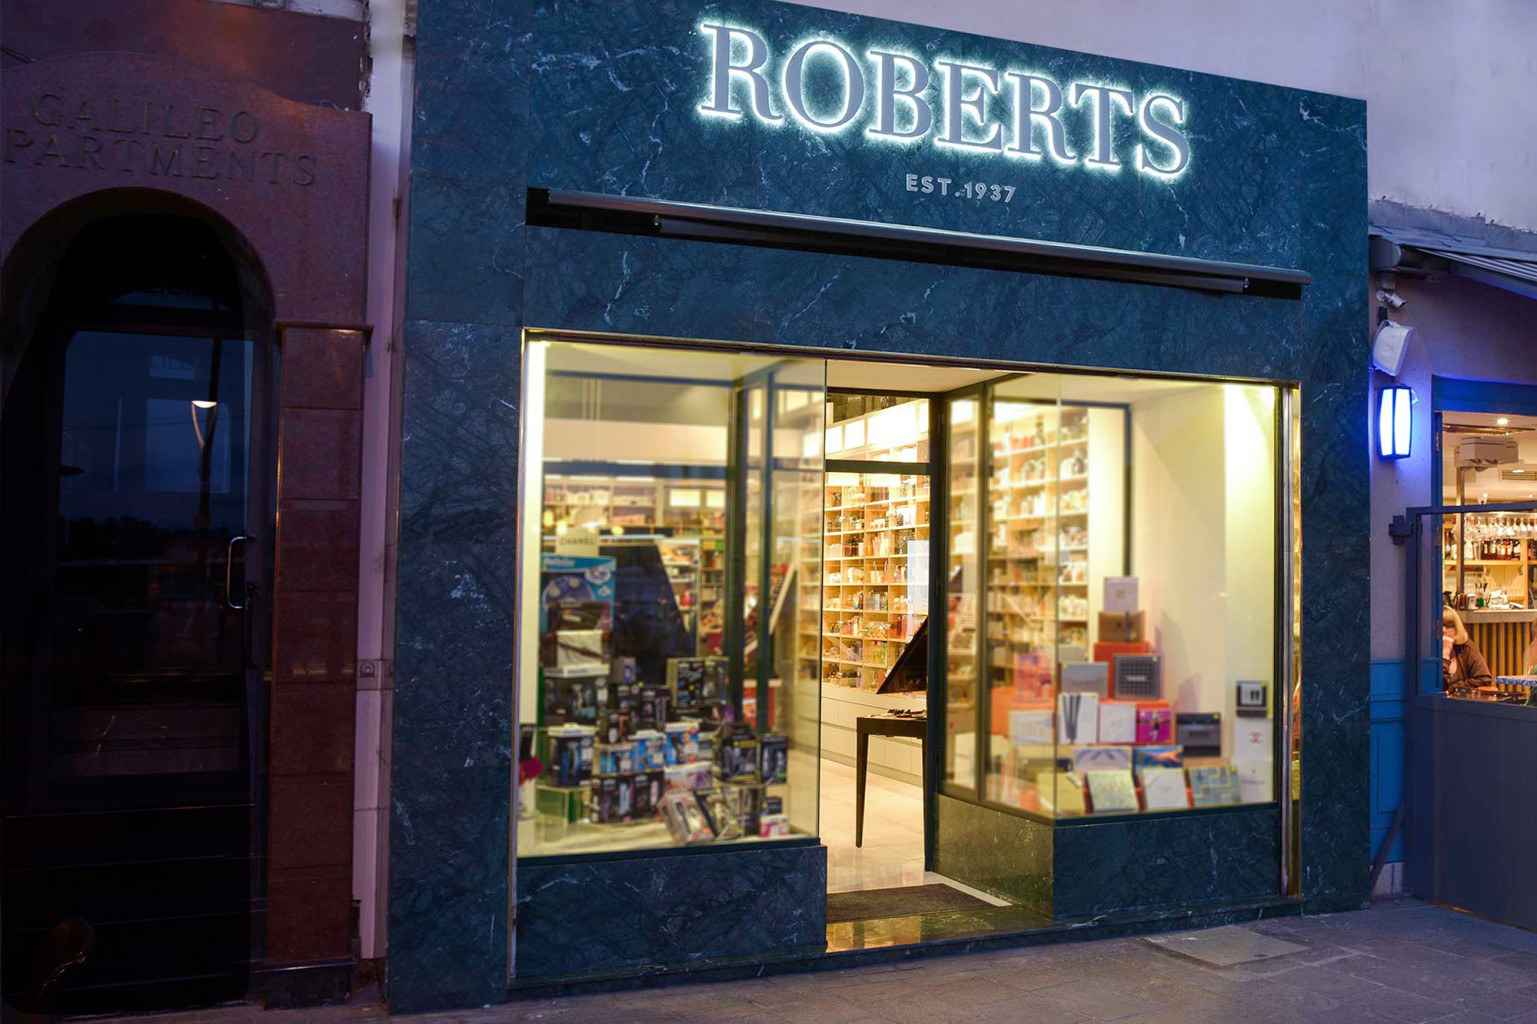 ROBERTS 01